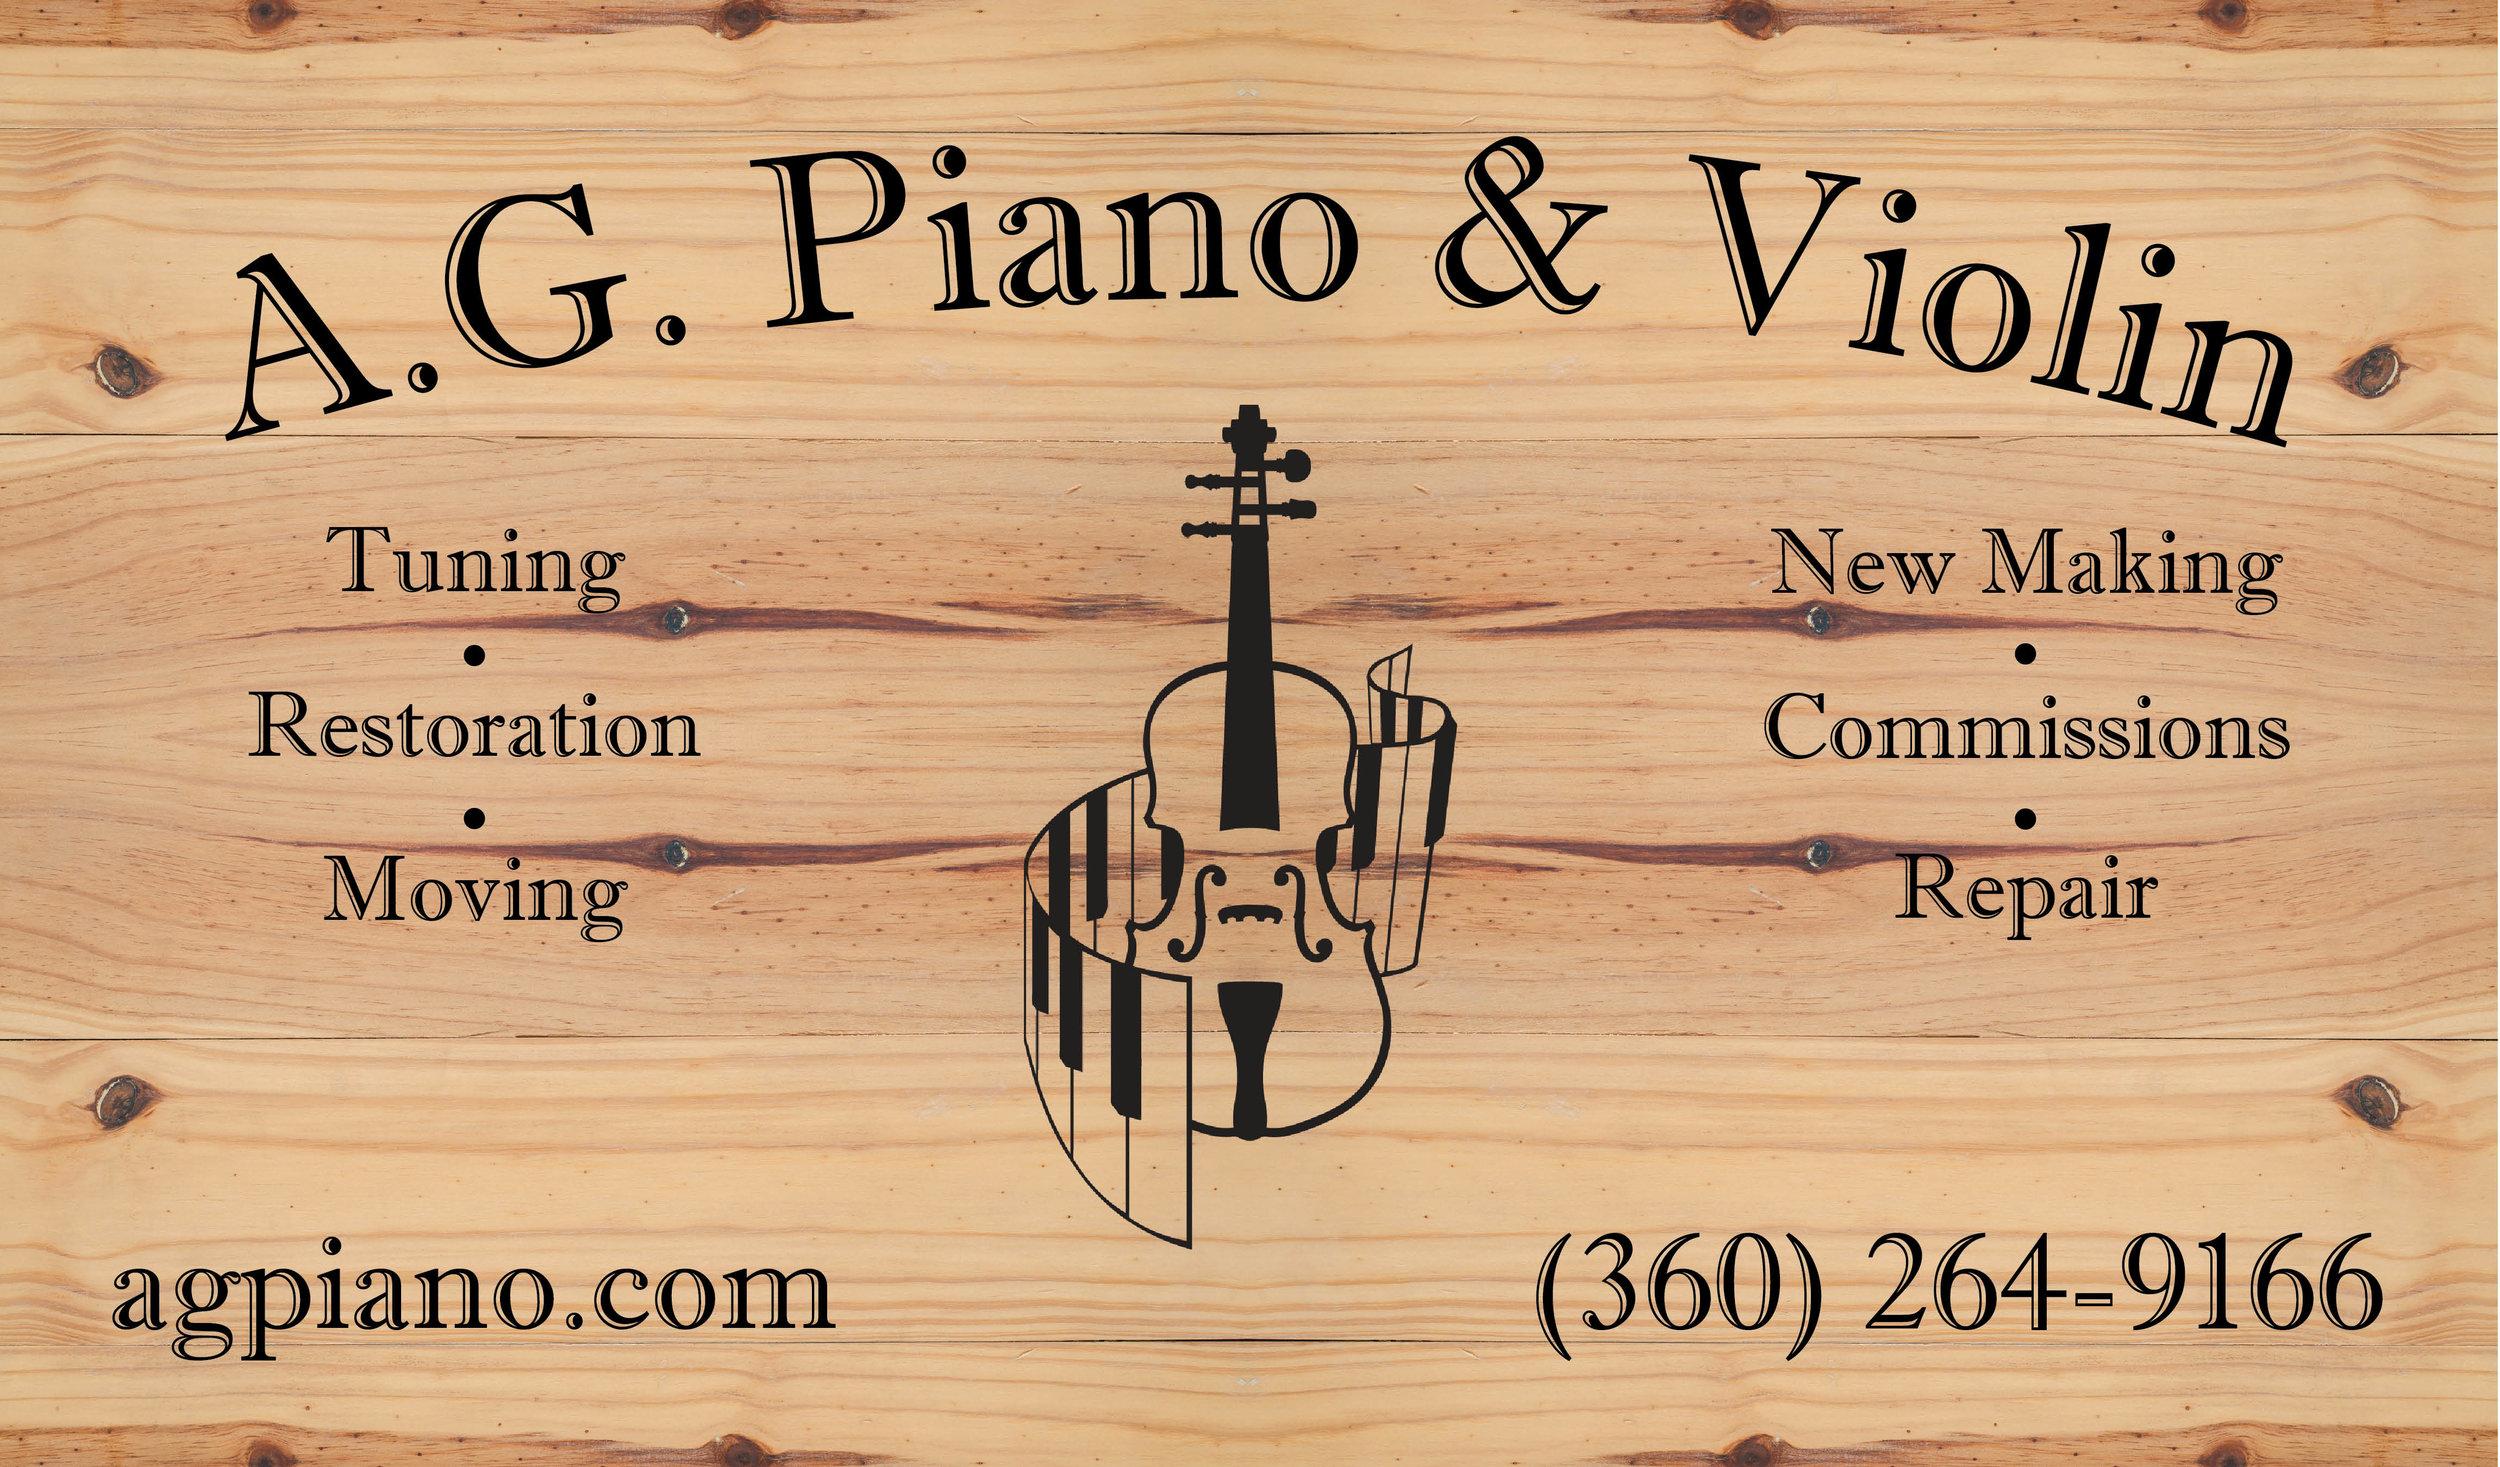 Need a Tuning? -